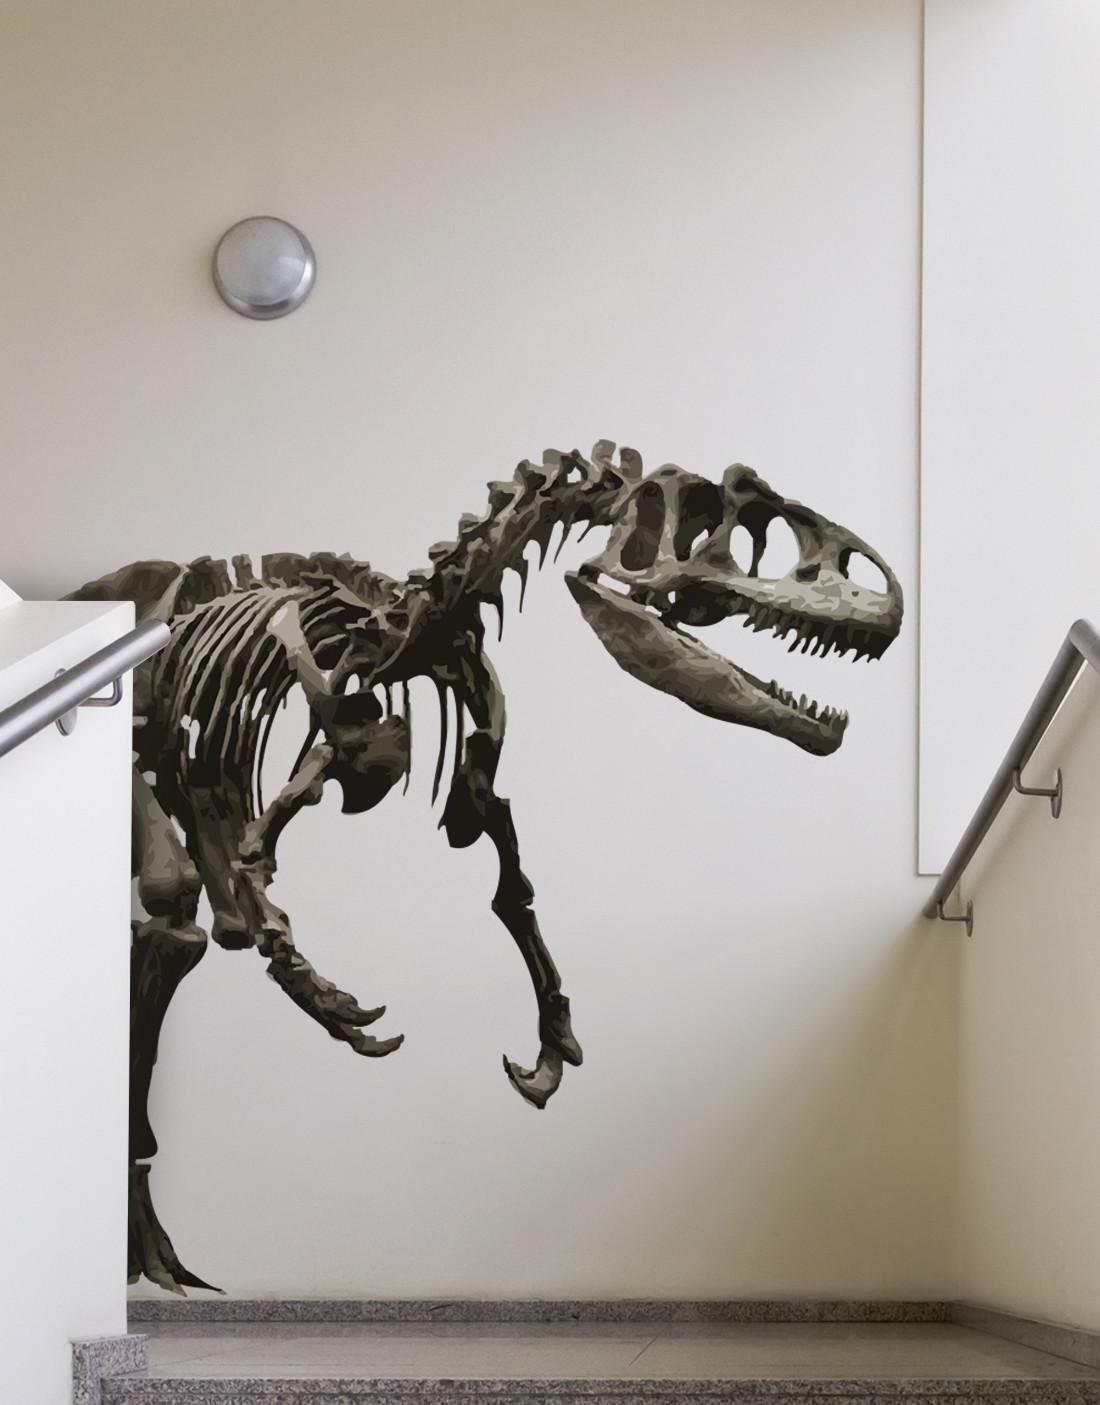 MMArtin153-Dino-Raptor-pict4.jpg